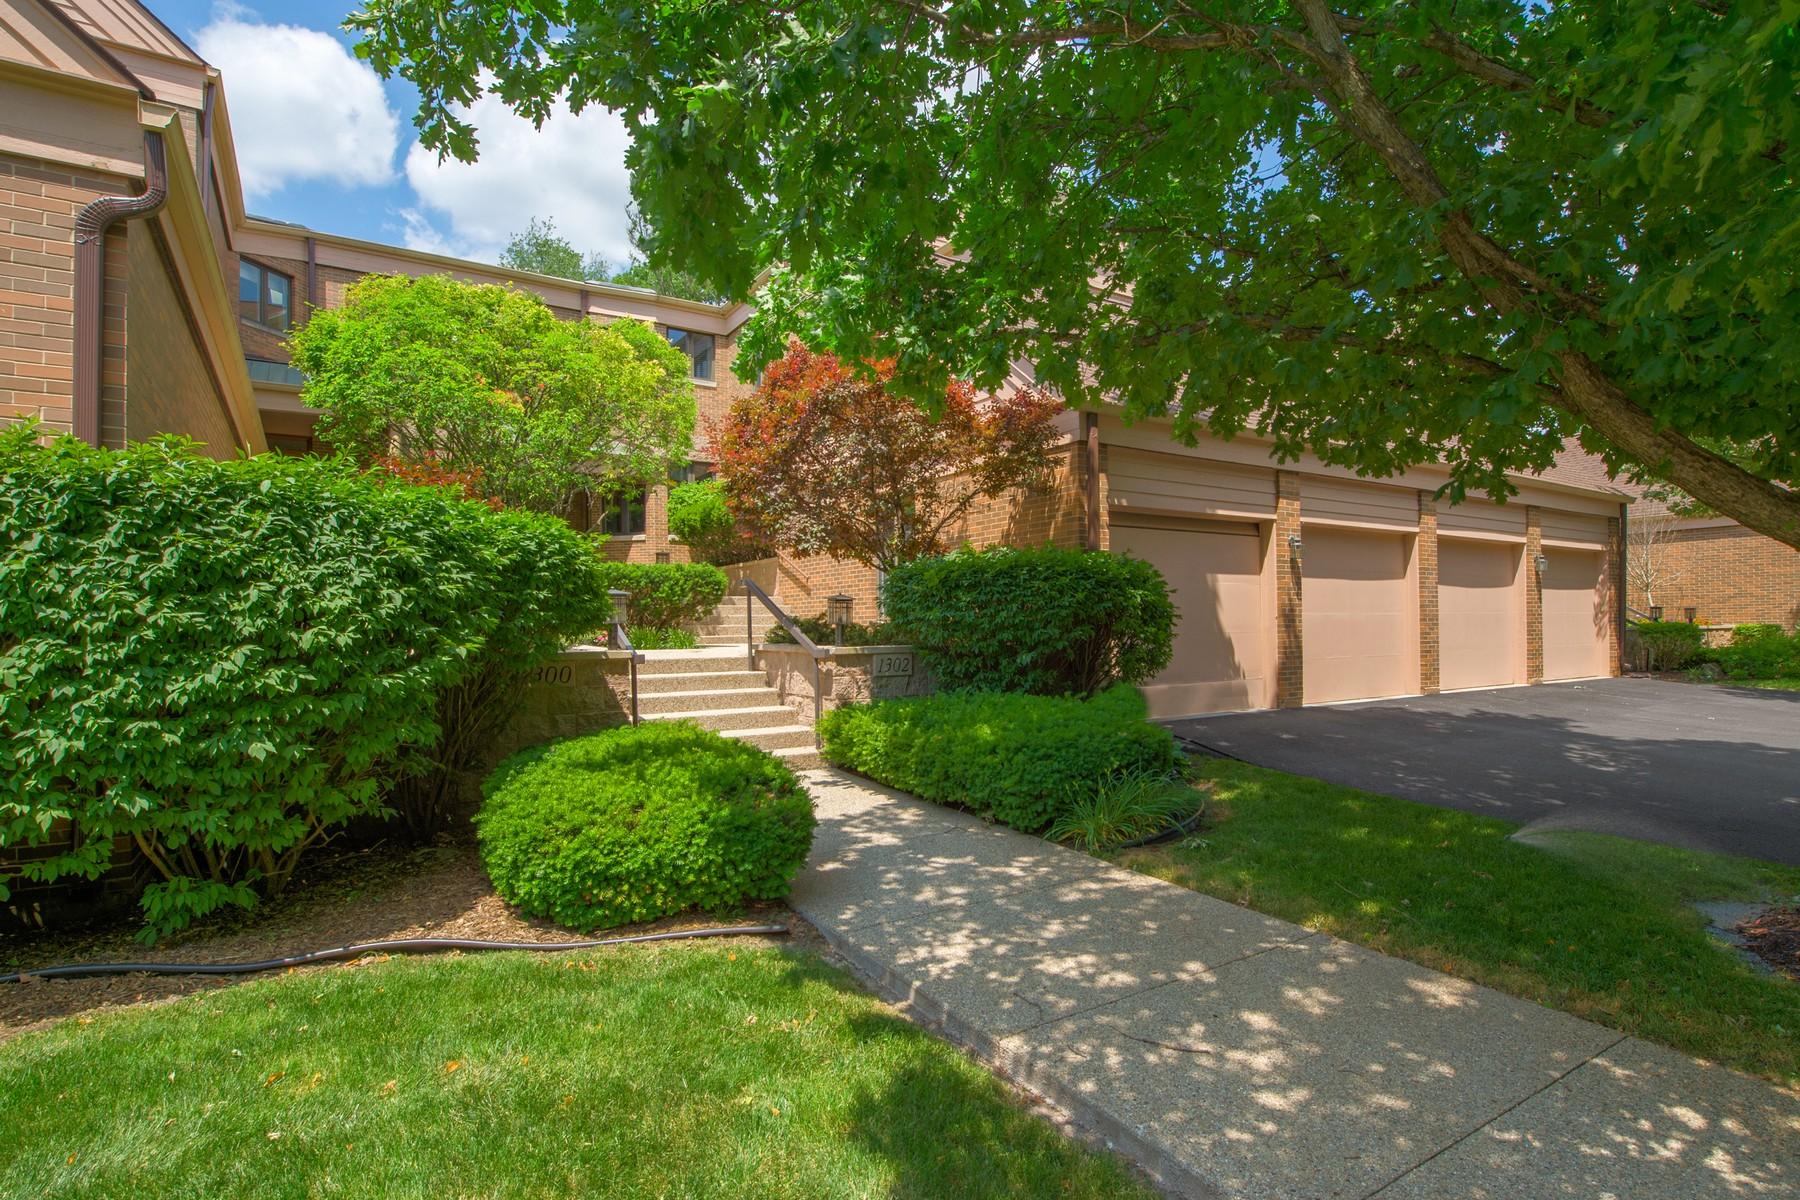 Vivienda unifamiliar por un Venta en Elegant without pretense 1302 Hawthorne Lane, Unit 1302, Hinsdale, Illinois, 60521 Estados Unidos